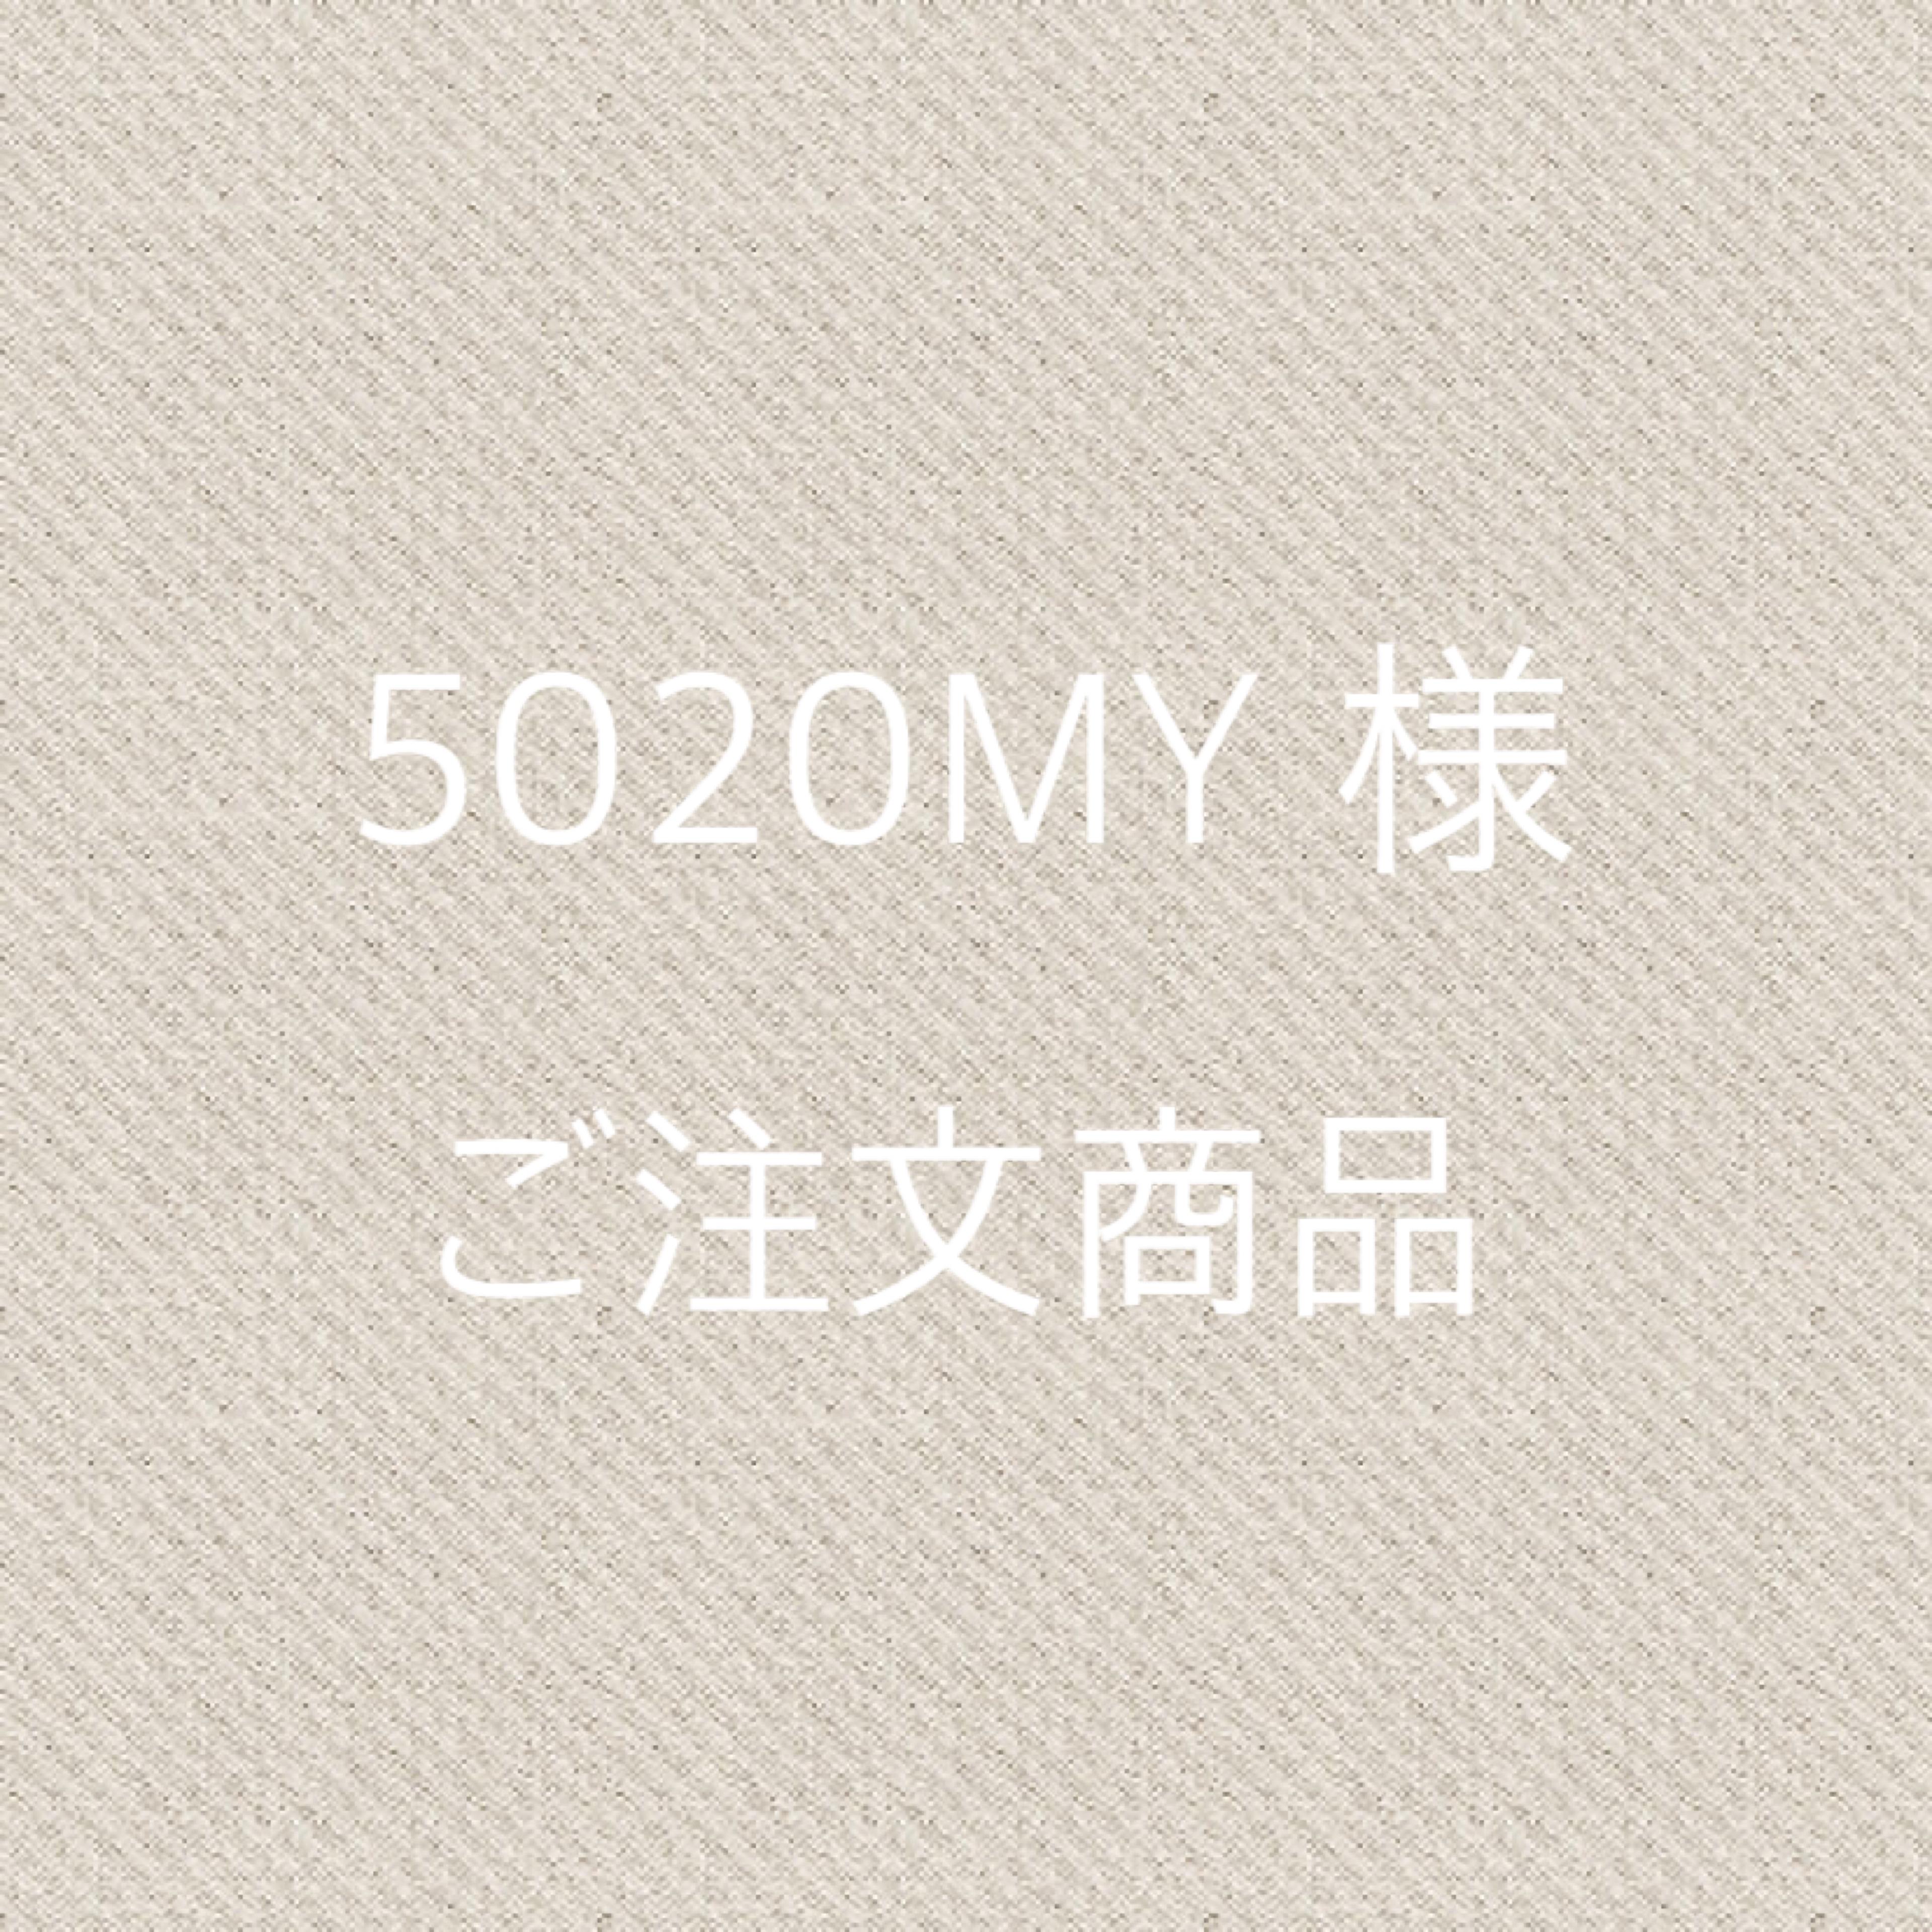 [ 5020MY 様 ] ご注文の商品となります。